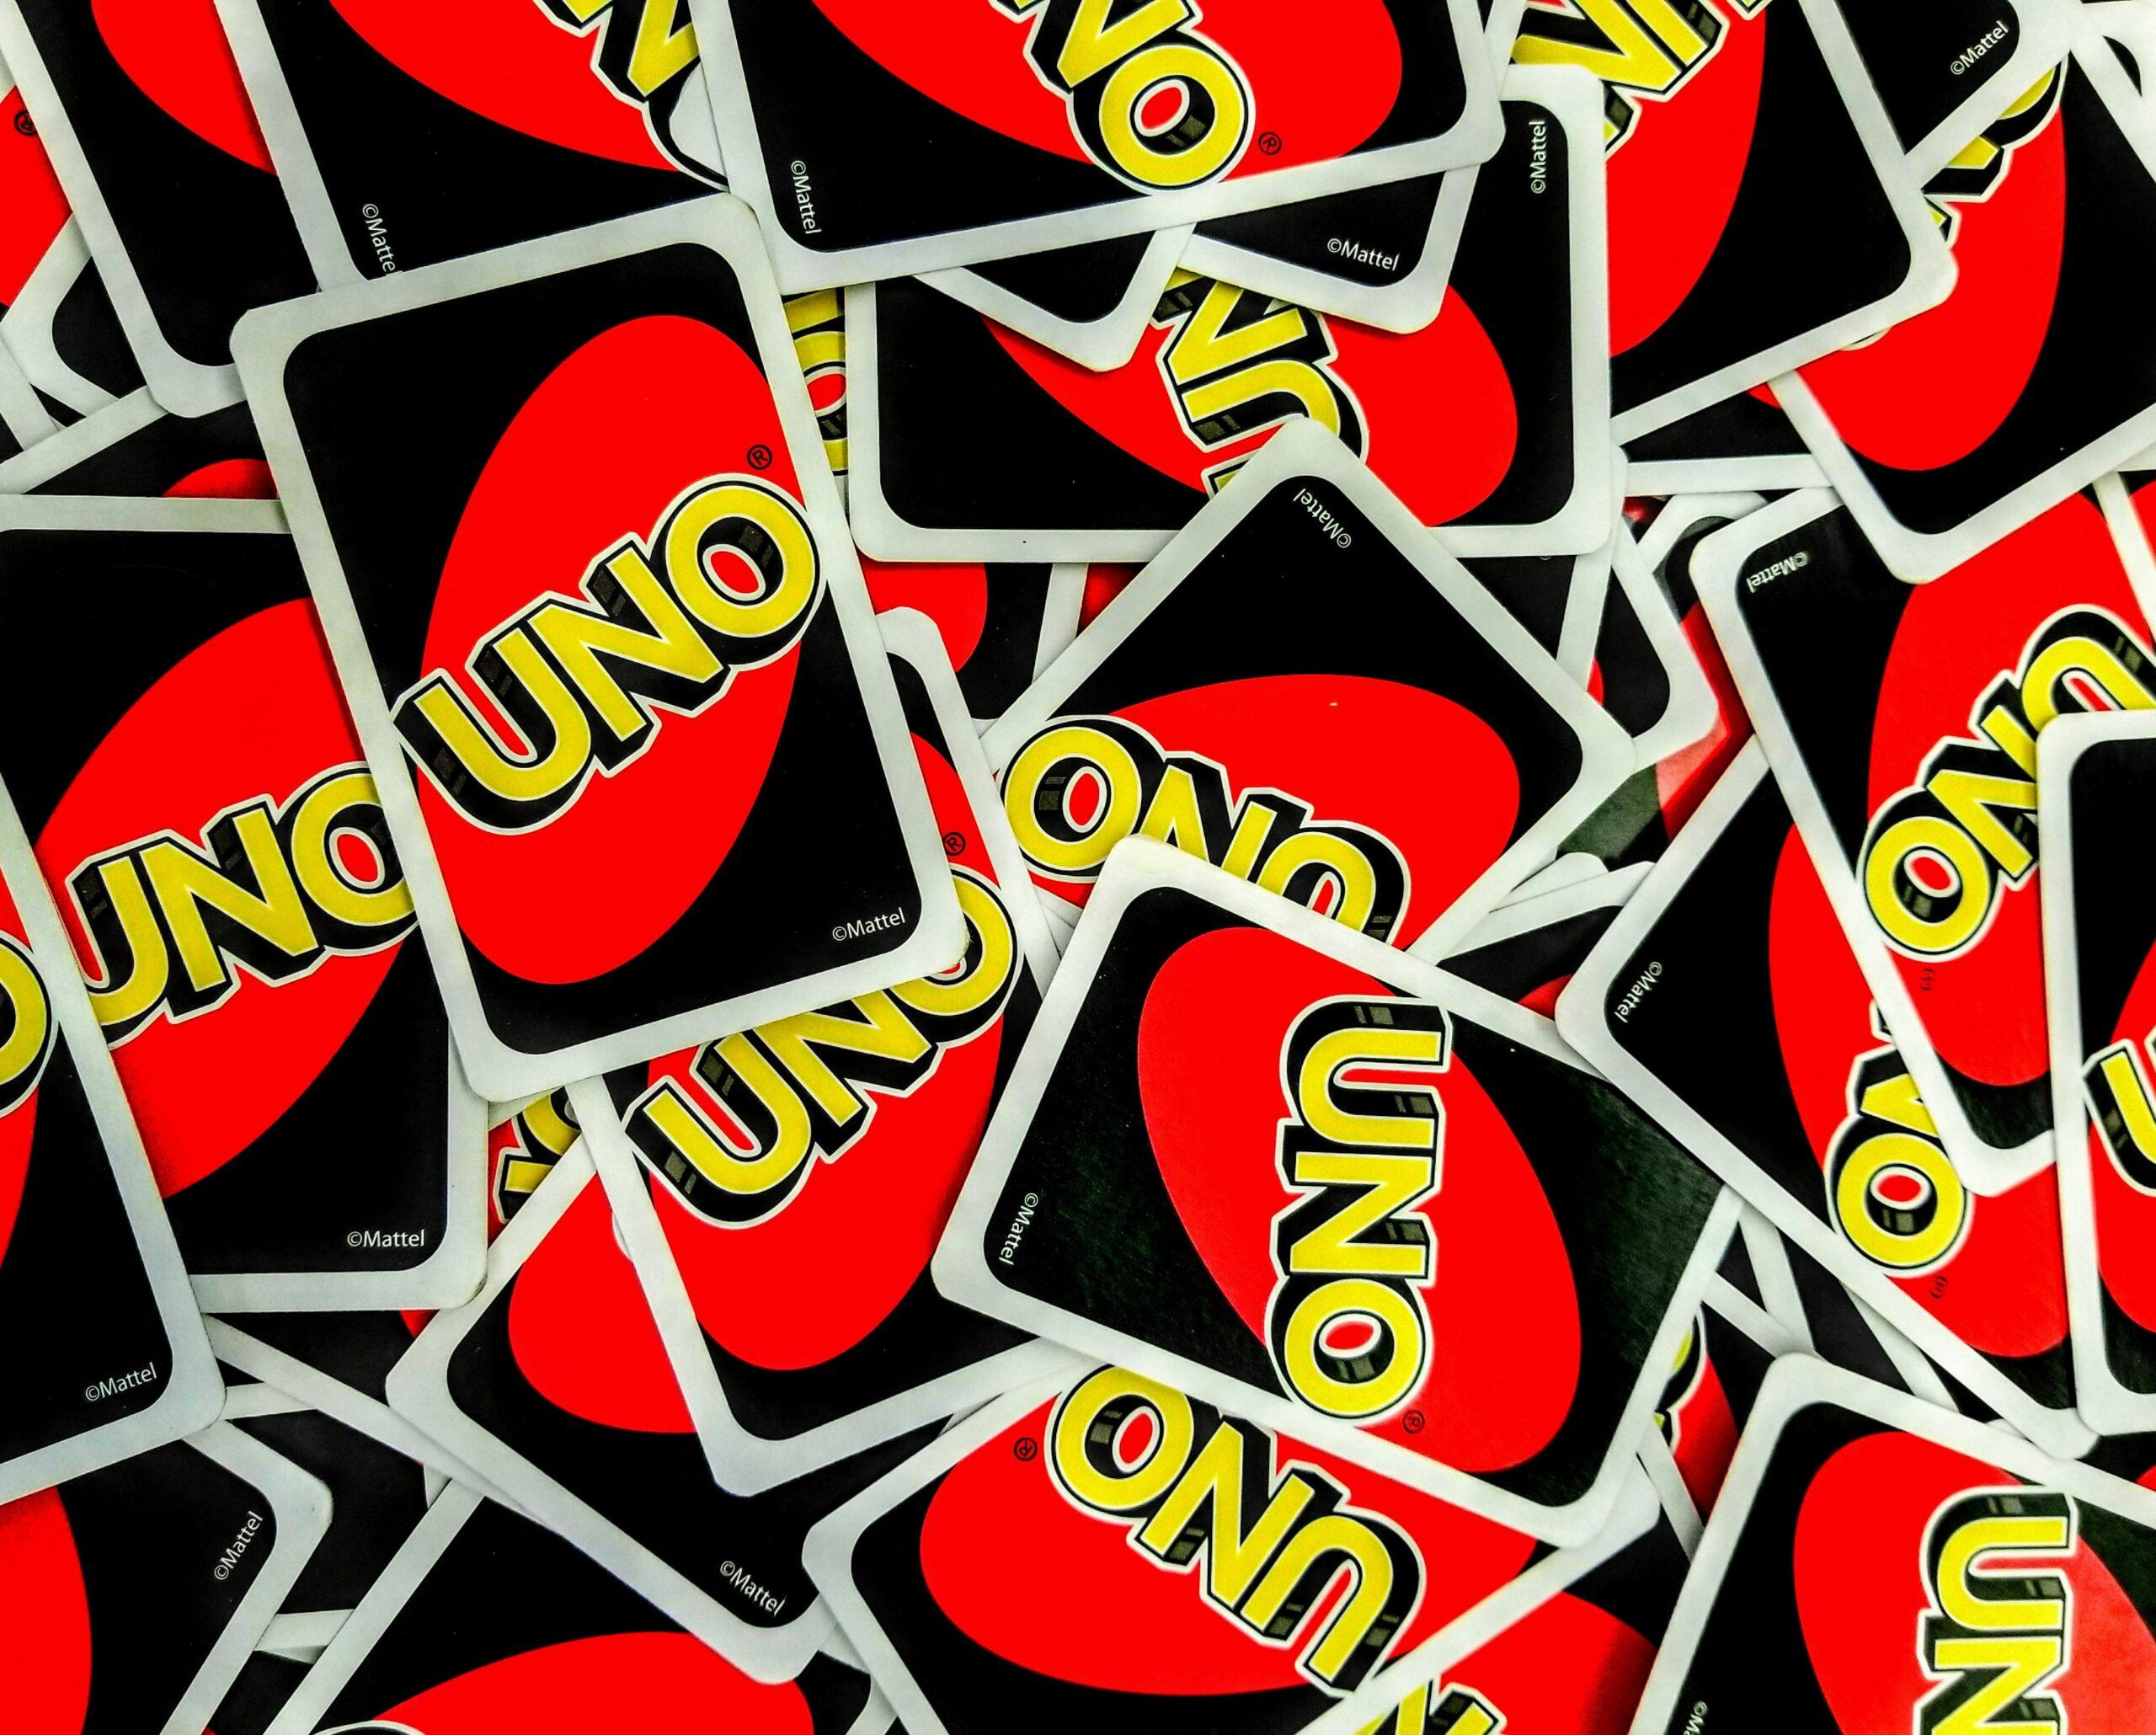 Uno (Kartenspiel) Regeln & Geschichte